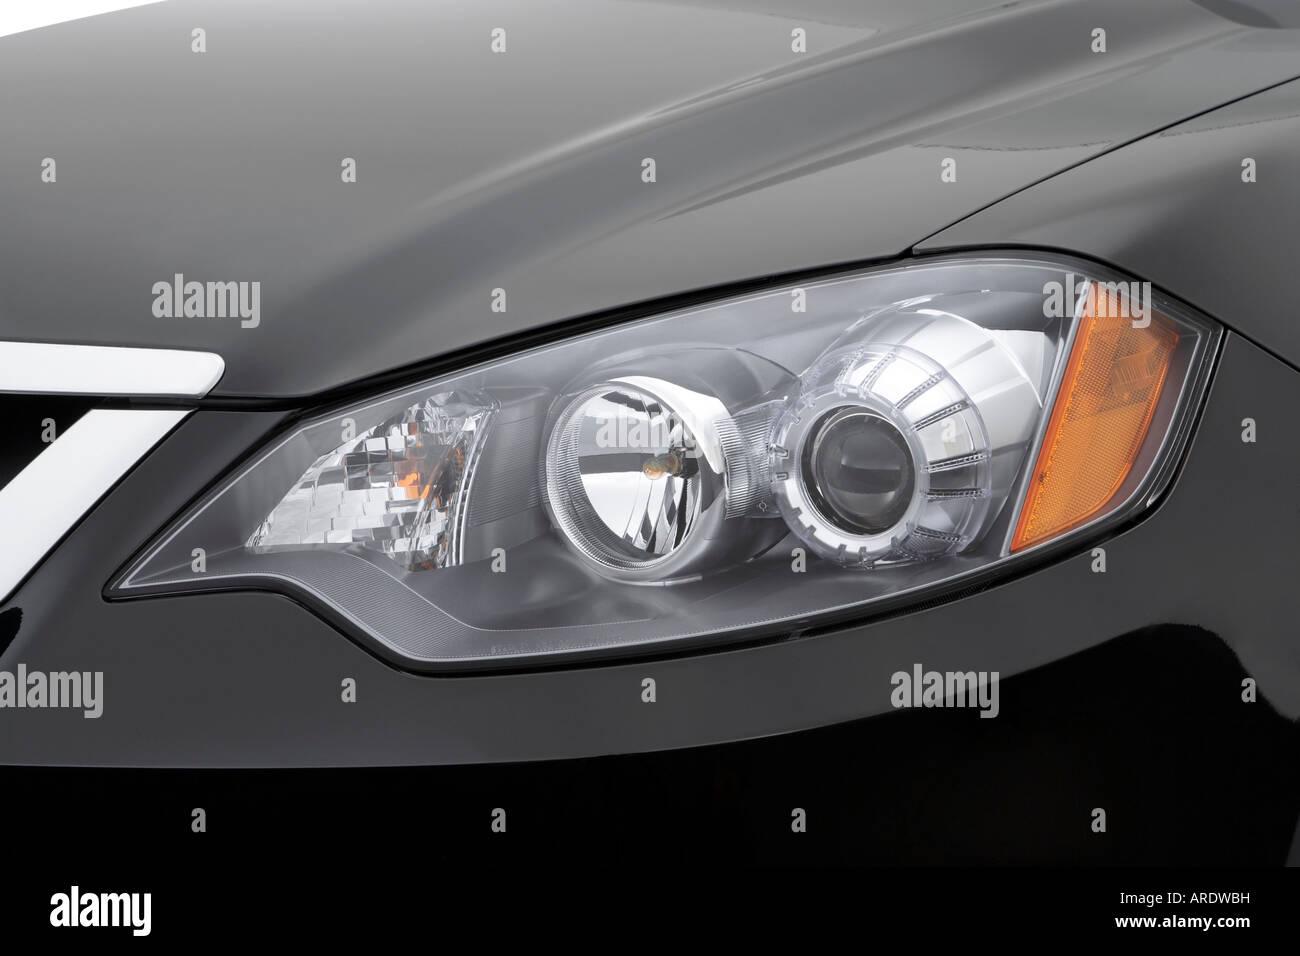 2007 Acura Rdx In Black Headlight Stock Photo Alamy